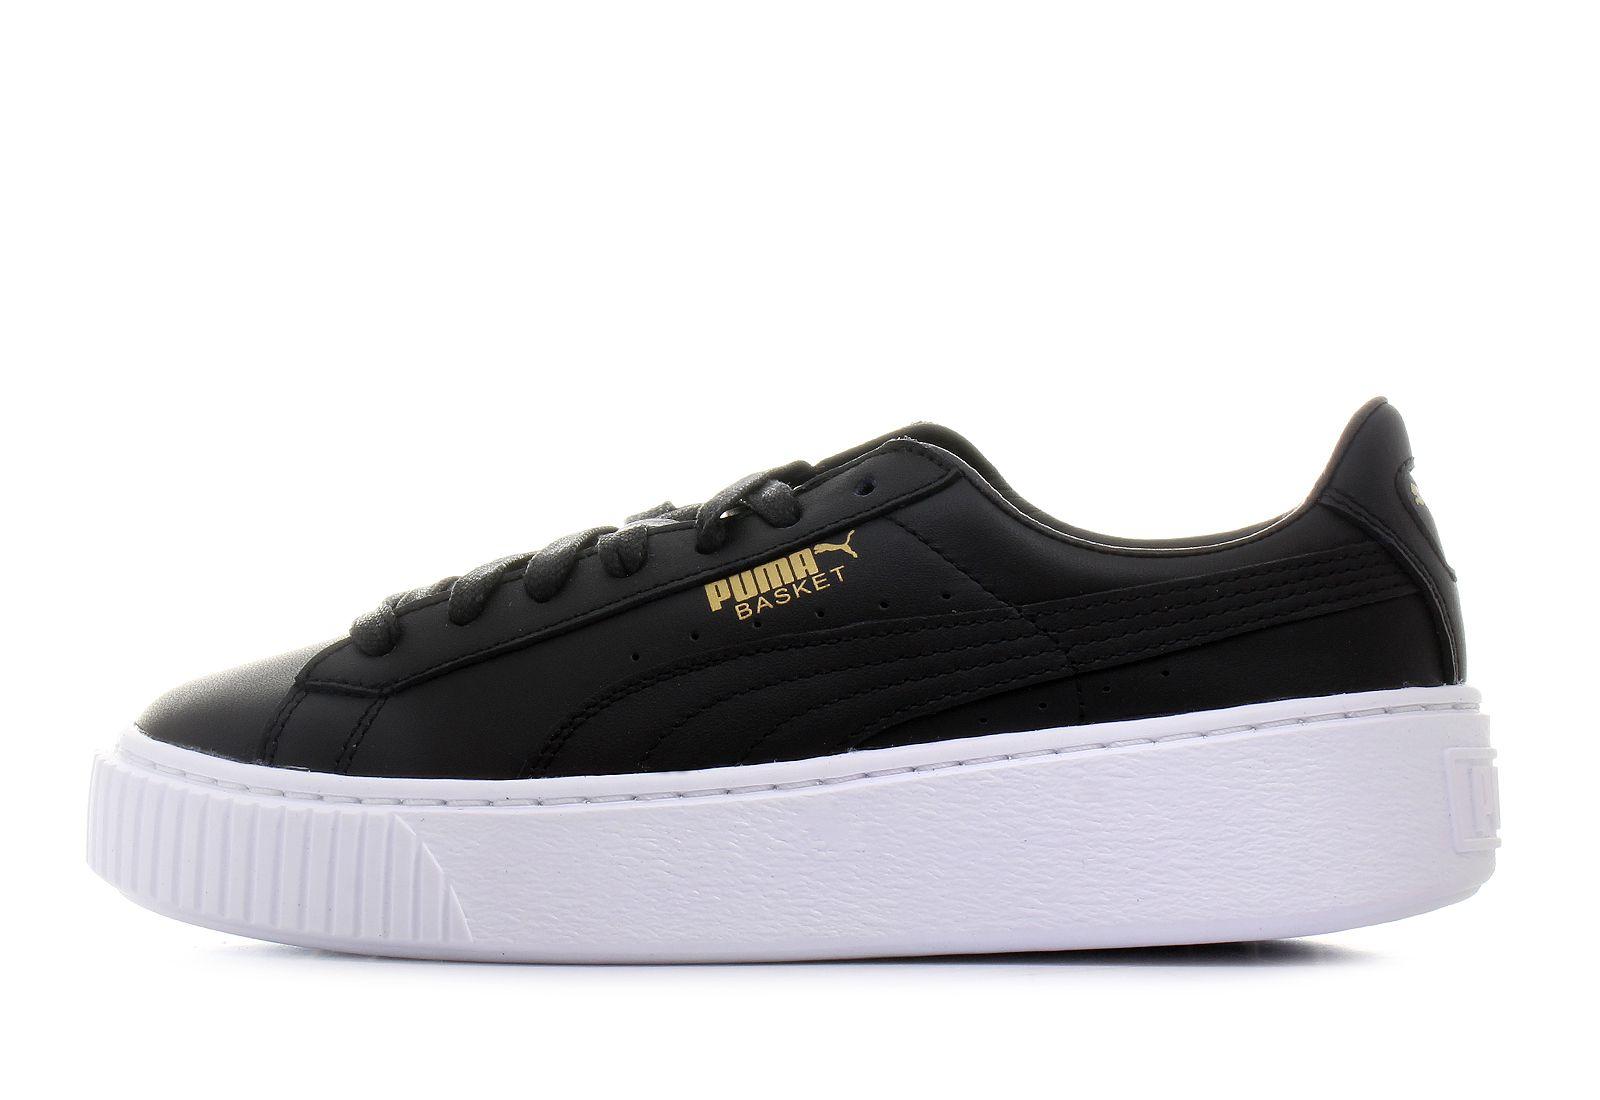 quality design 2d81a 26eed Puma Shoes - Basket Platform Core - 36404003-blk - Online shop for  sneakers, shoes and boots